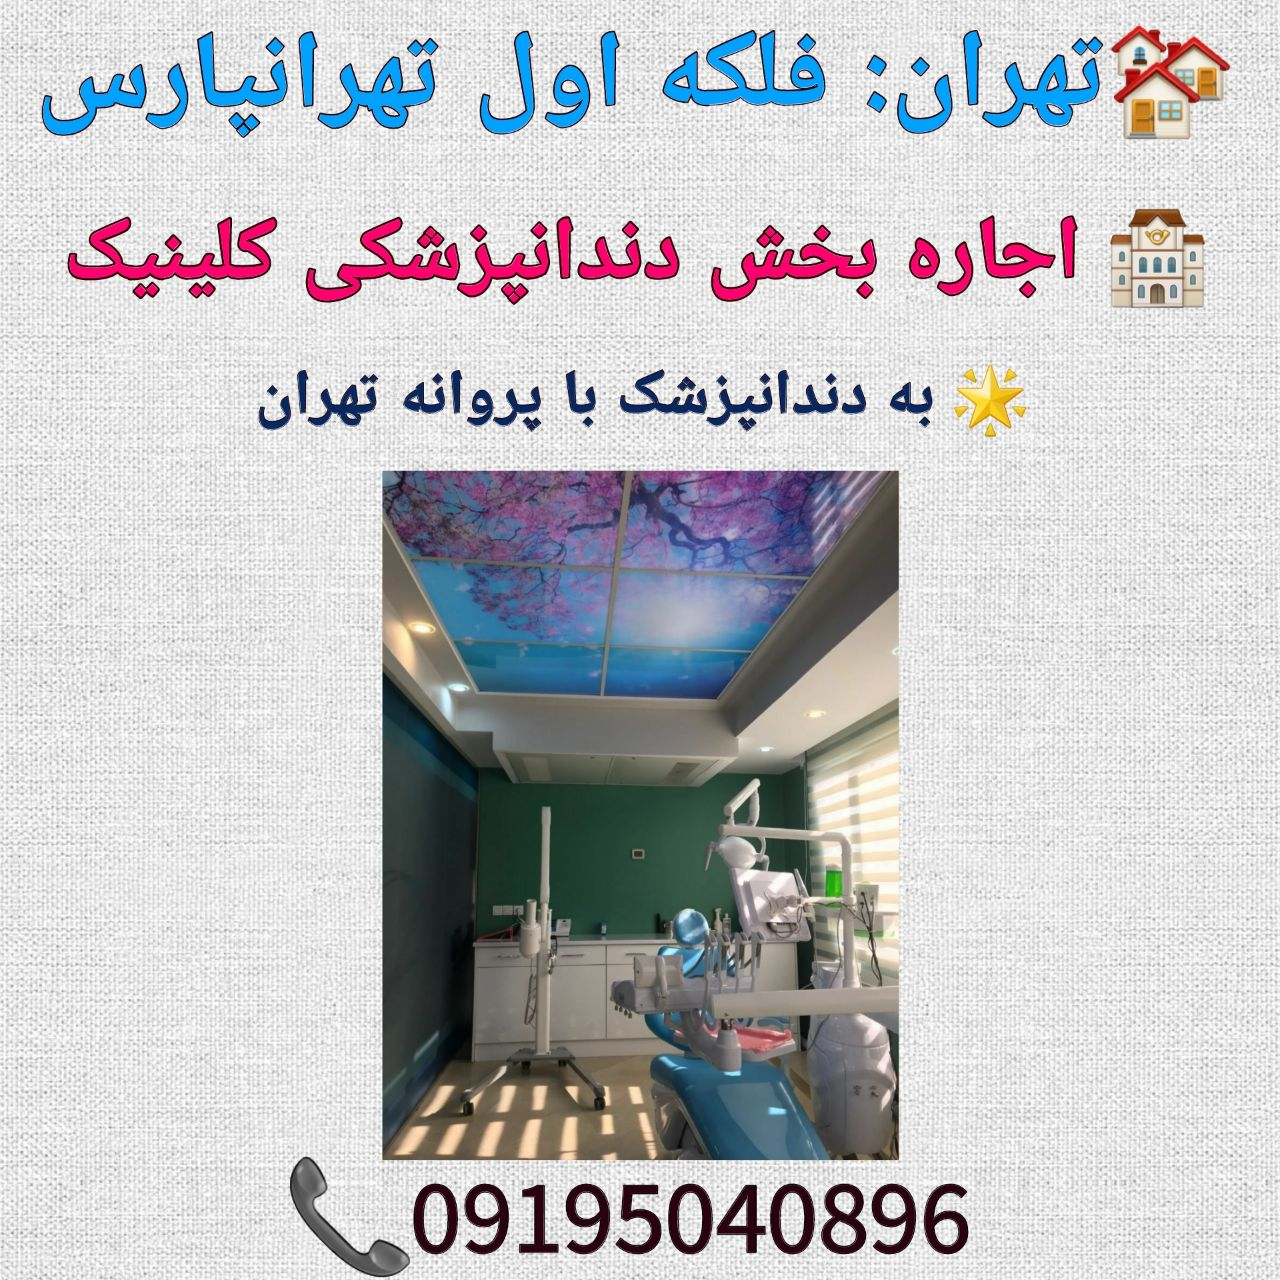 تهران: فلکه اول تهرانپارس، اجاره بخش دندانپزشکی کلینیک